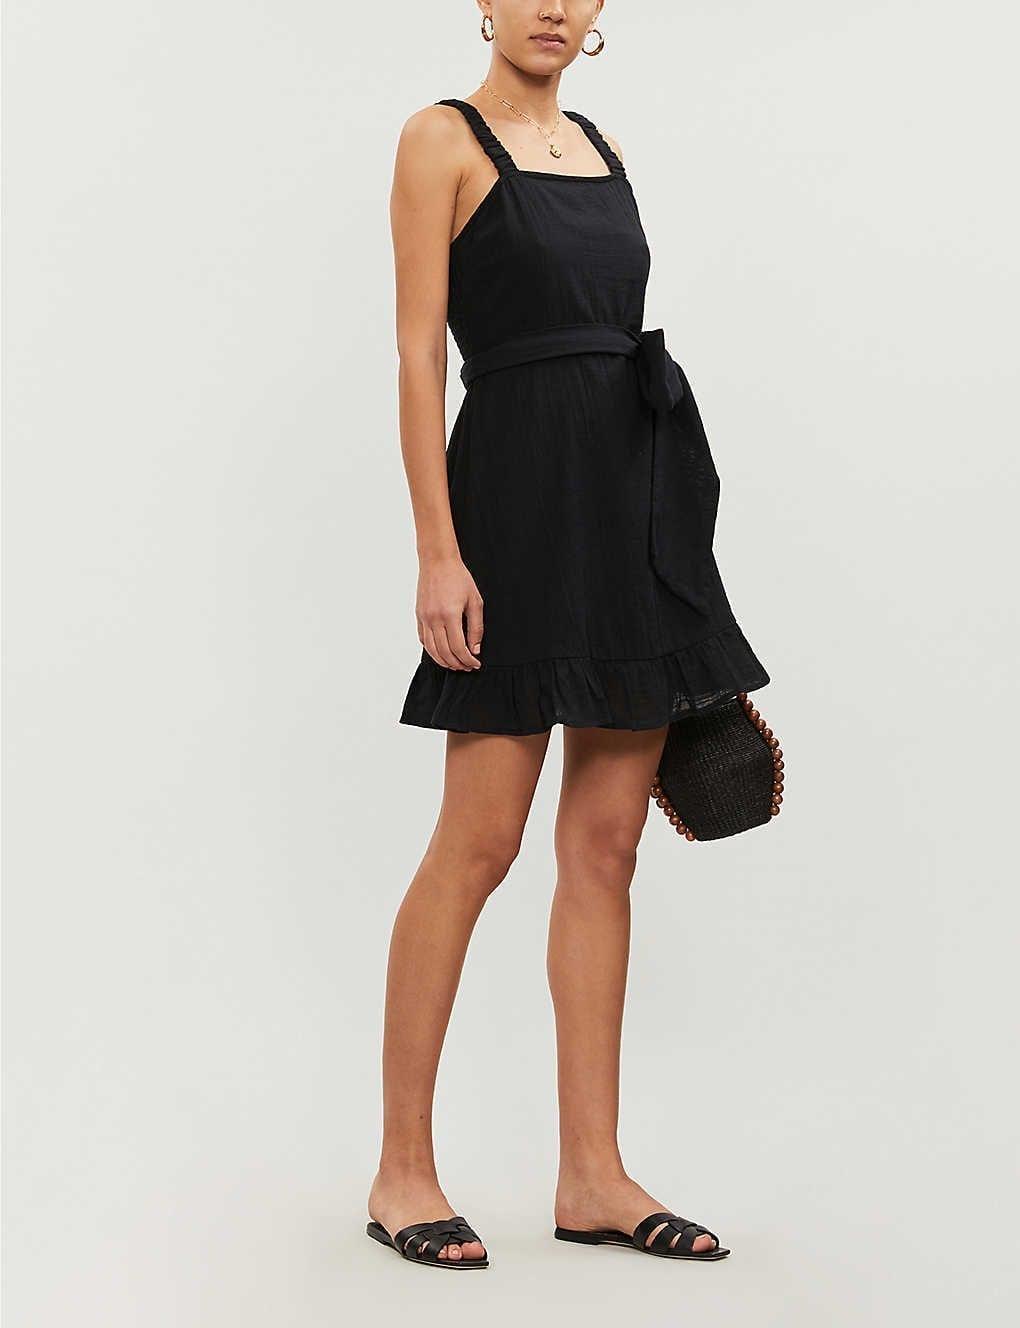 BILLABONG X SINCERELY JULES Saw It Coming Ruffled Cotton Mini Dress